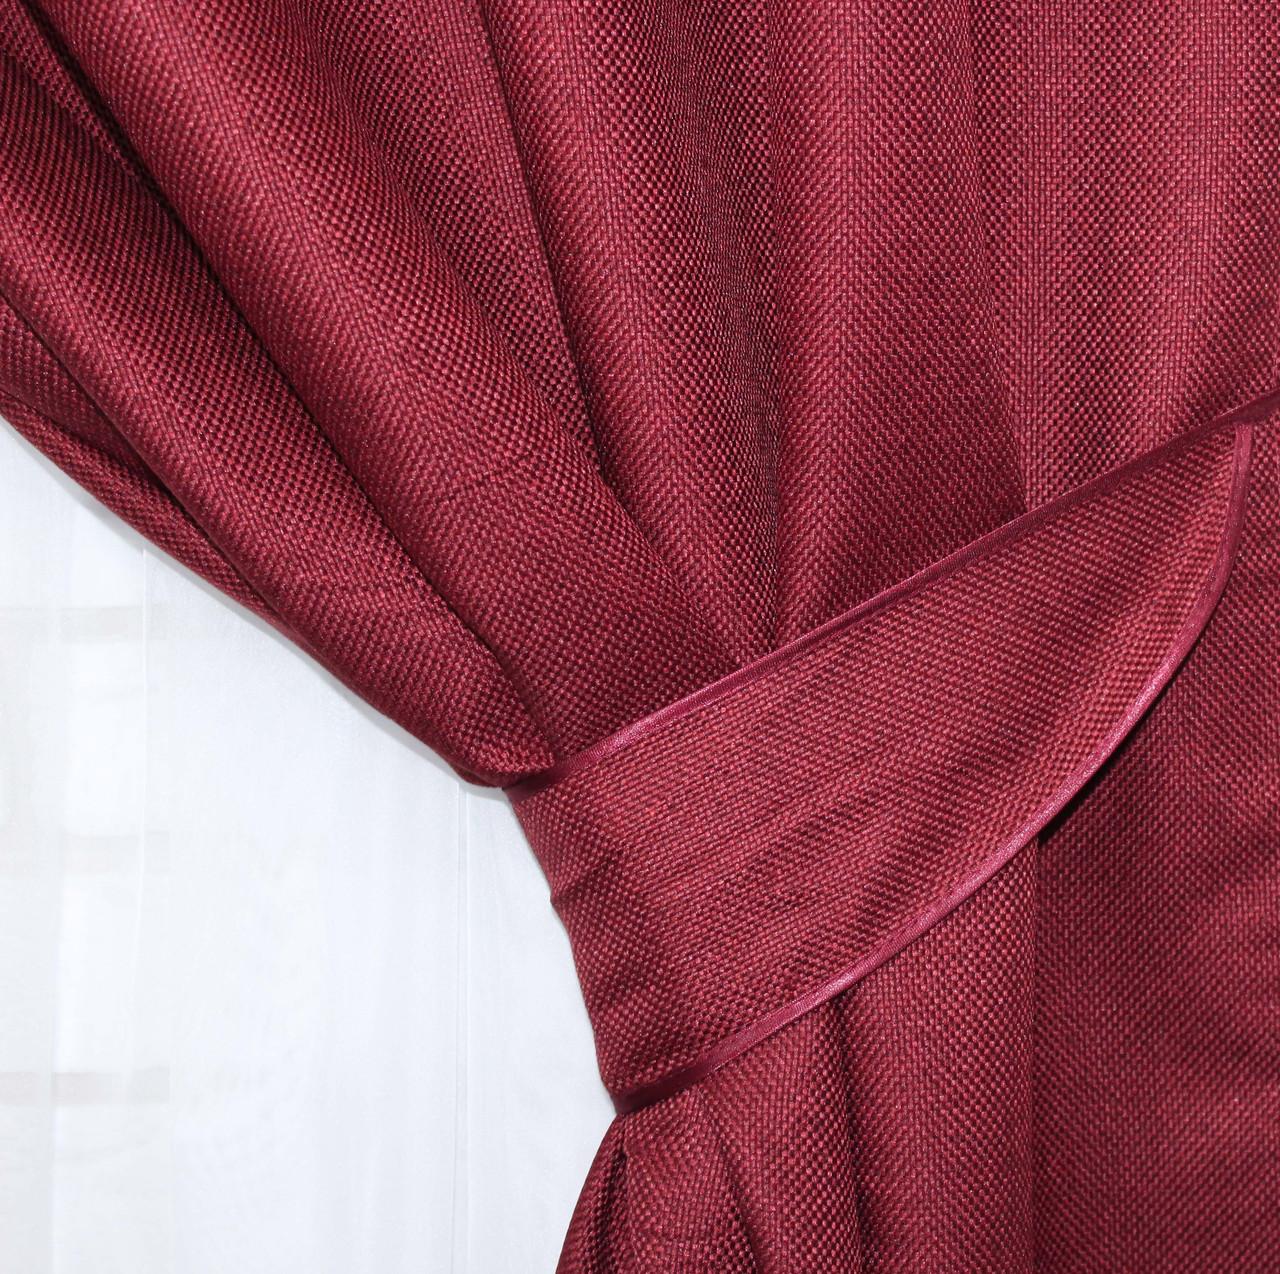 "Светонепроницаемая ткань блэкаут с фактурой ""Лен мешковина"". Высота 2,8м. Цвет бордовый. 319ш"